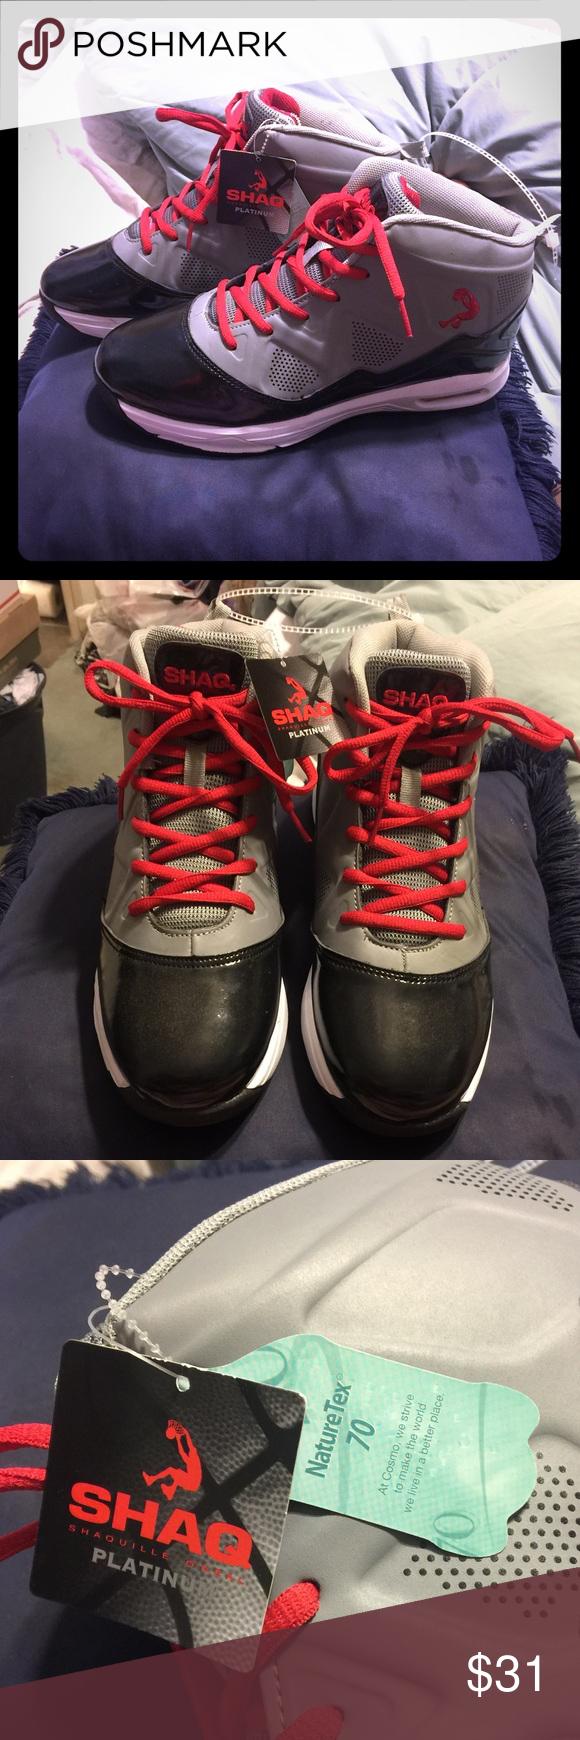 brand new shaq basketball shoes nwt my posh picks pinterest rh pinterest com